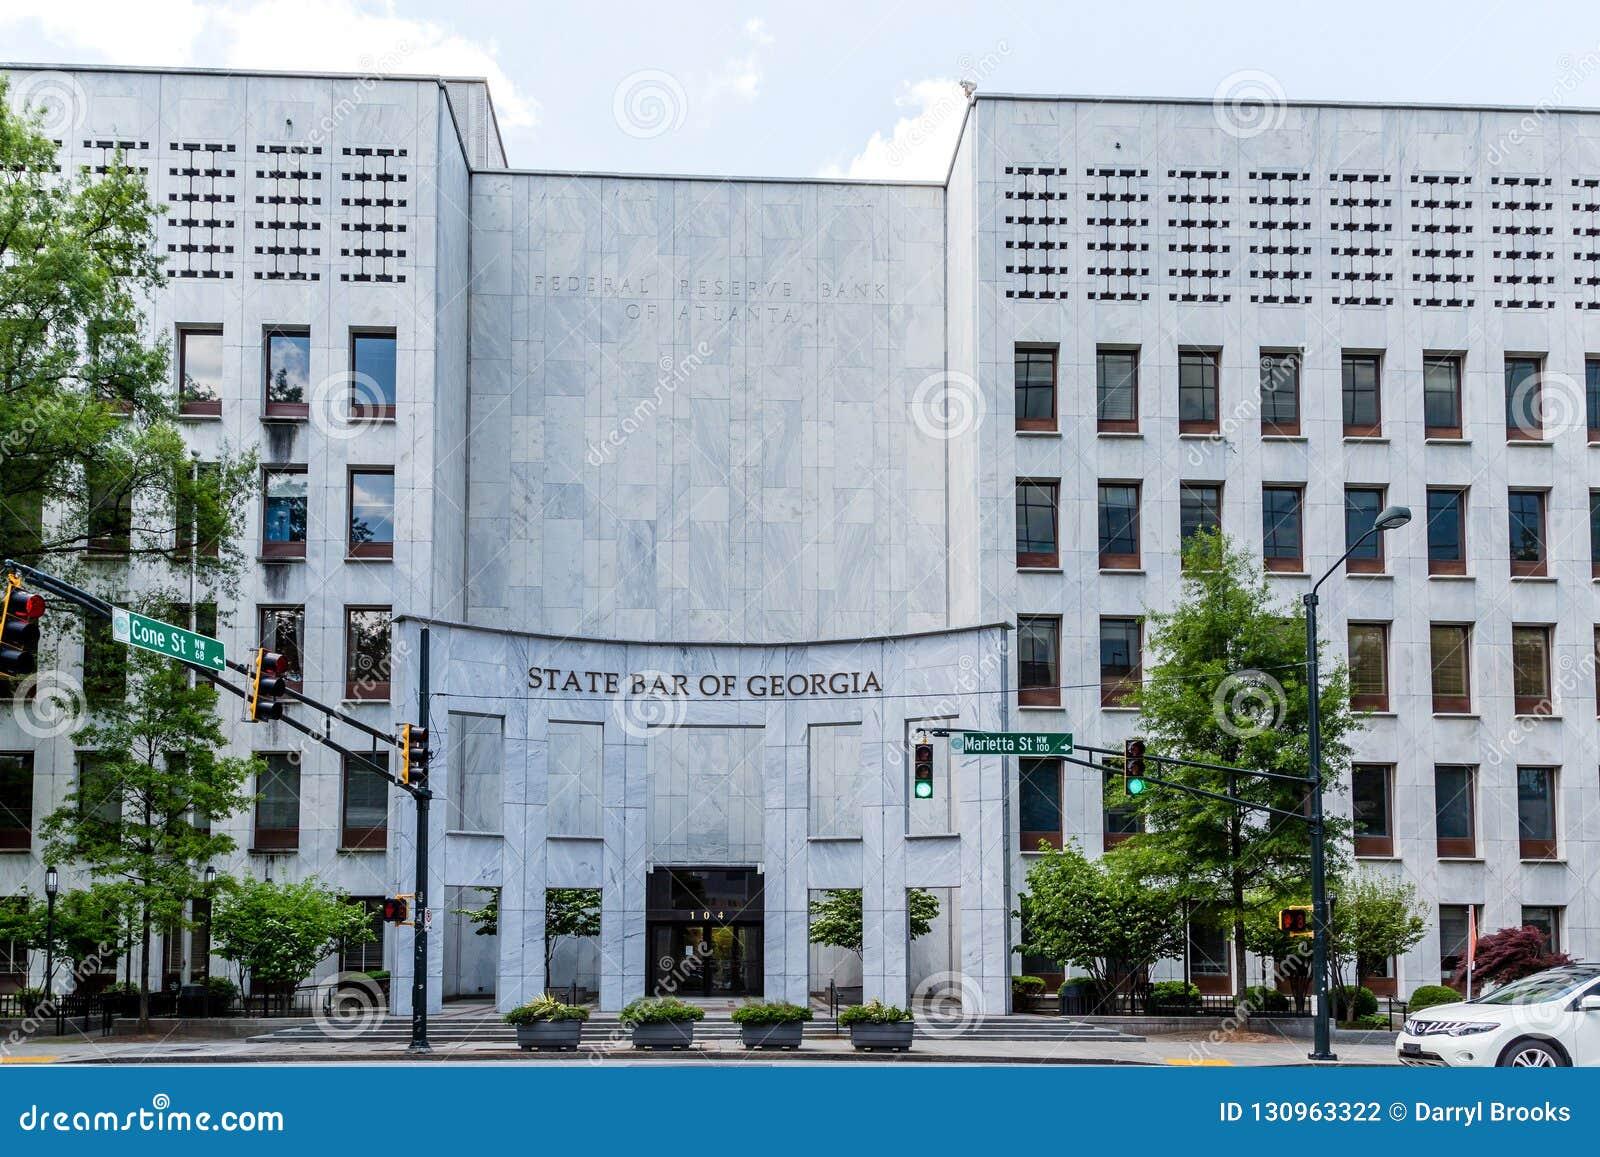 Federal Reserve Bank Atlanta Editorial Photography - Image